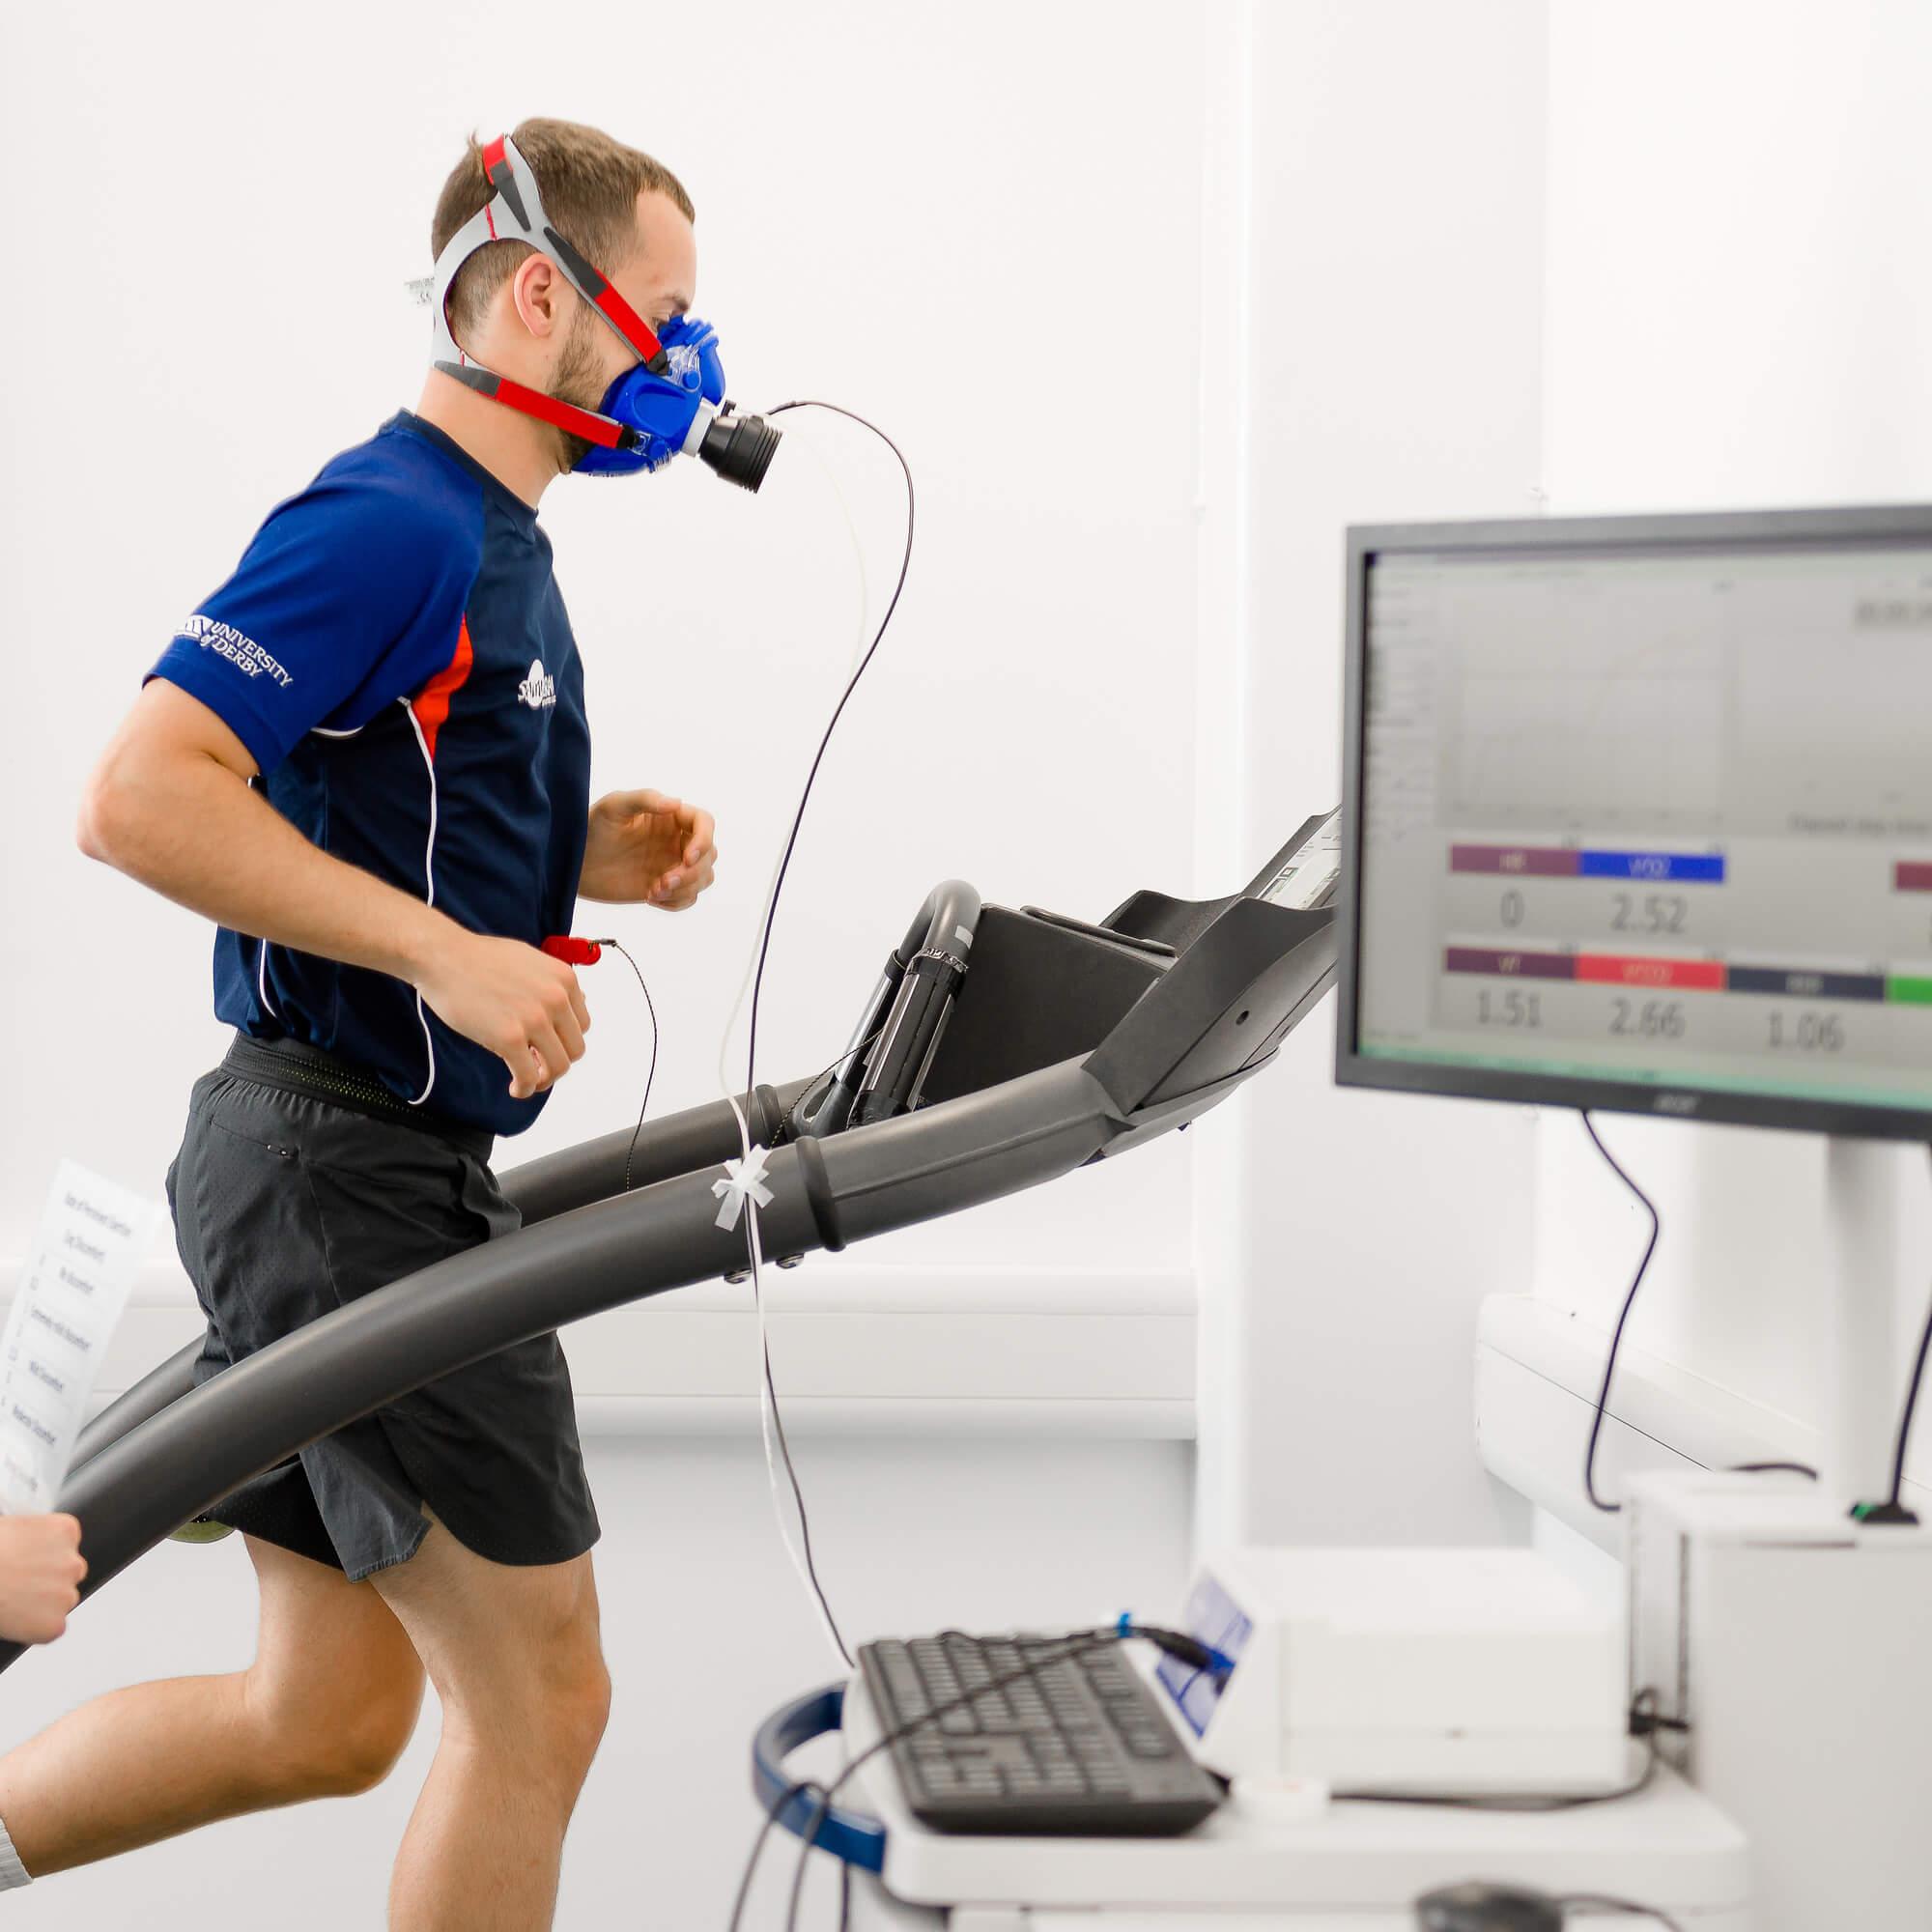 Athlete undergoing VO2 max test on treadmill